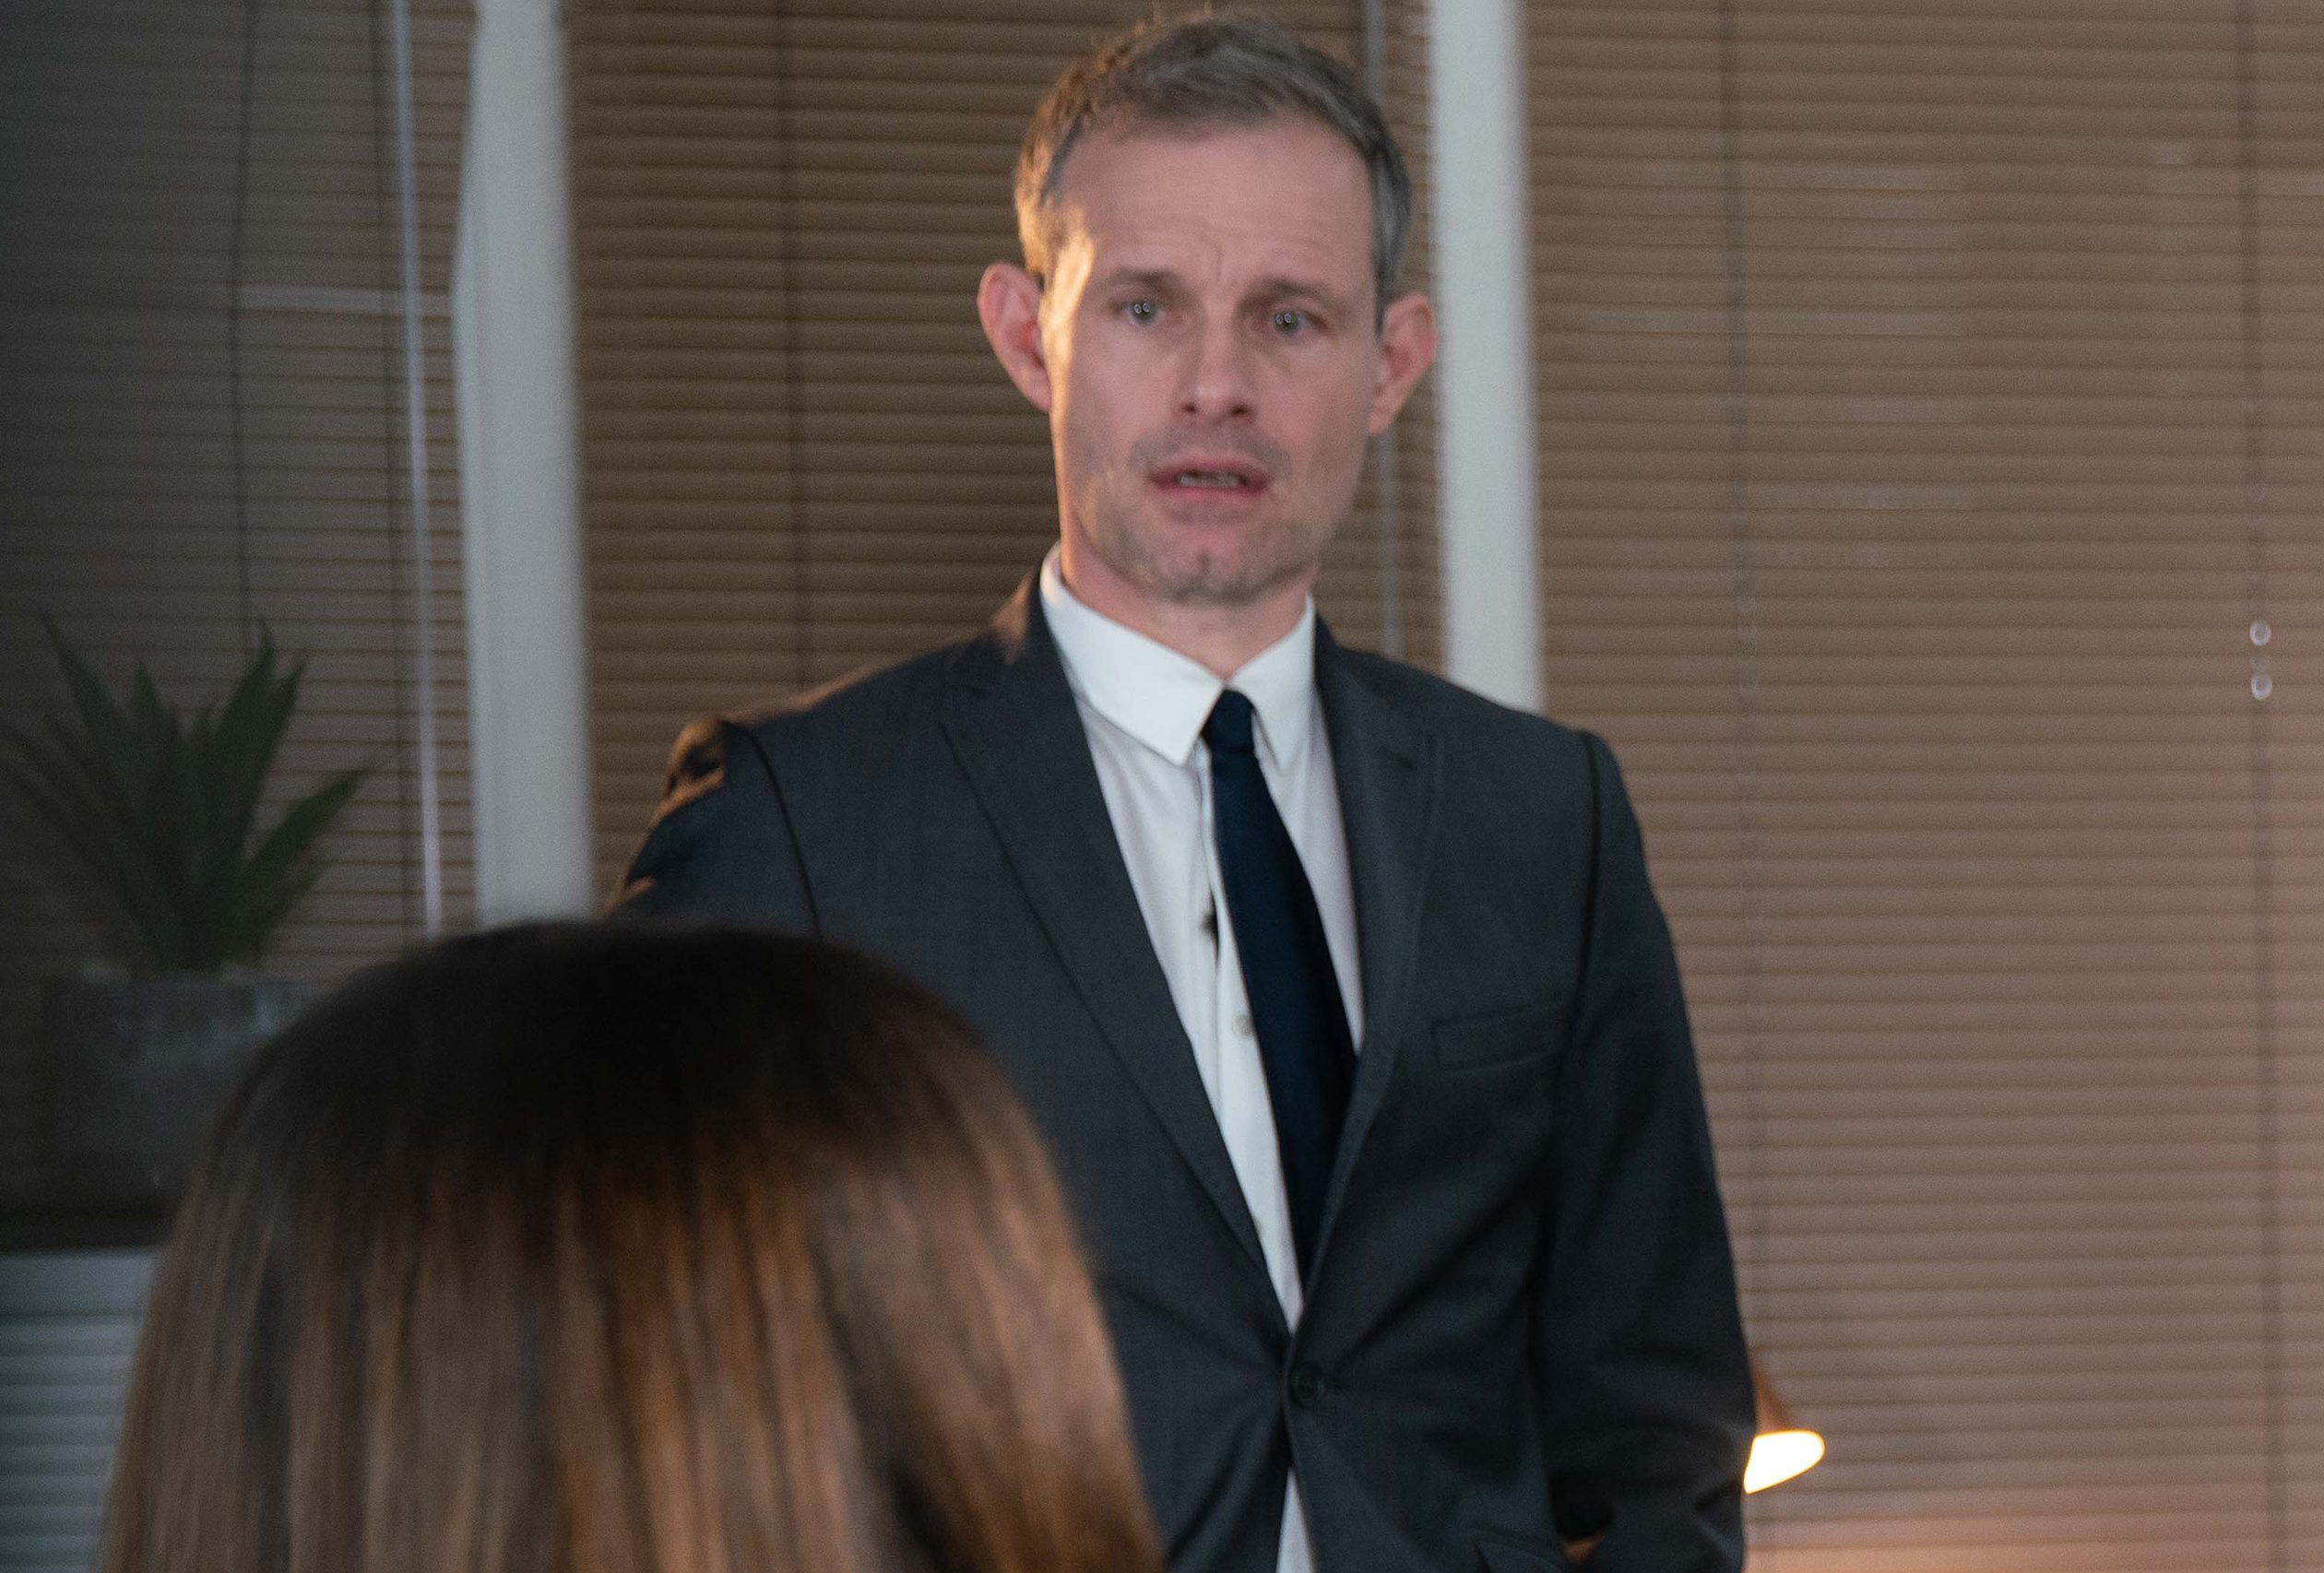 Coronation Street spoilers: What is Nick Tilsley hiding? Leanne grows suspicious